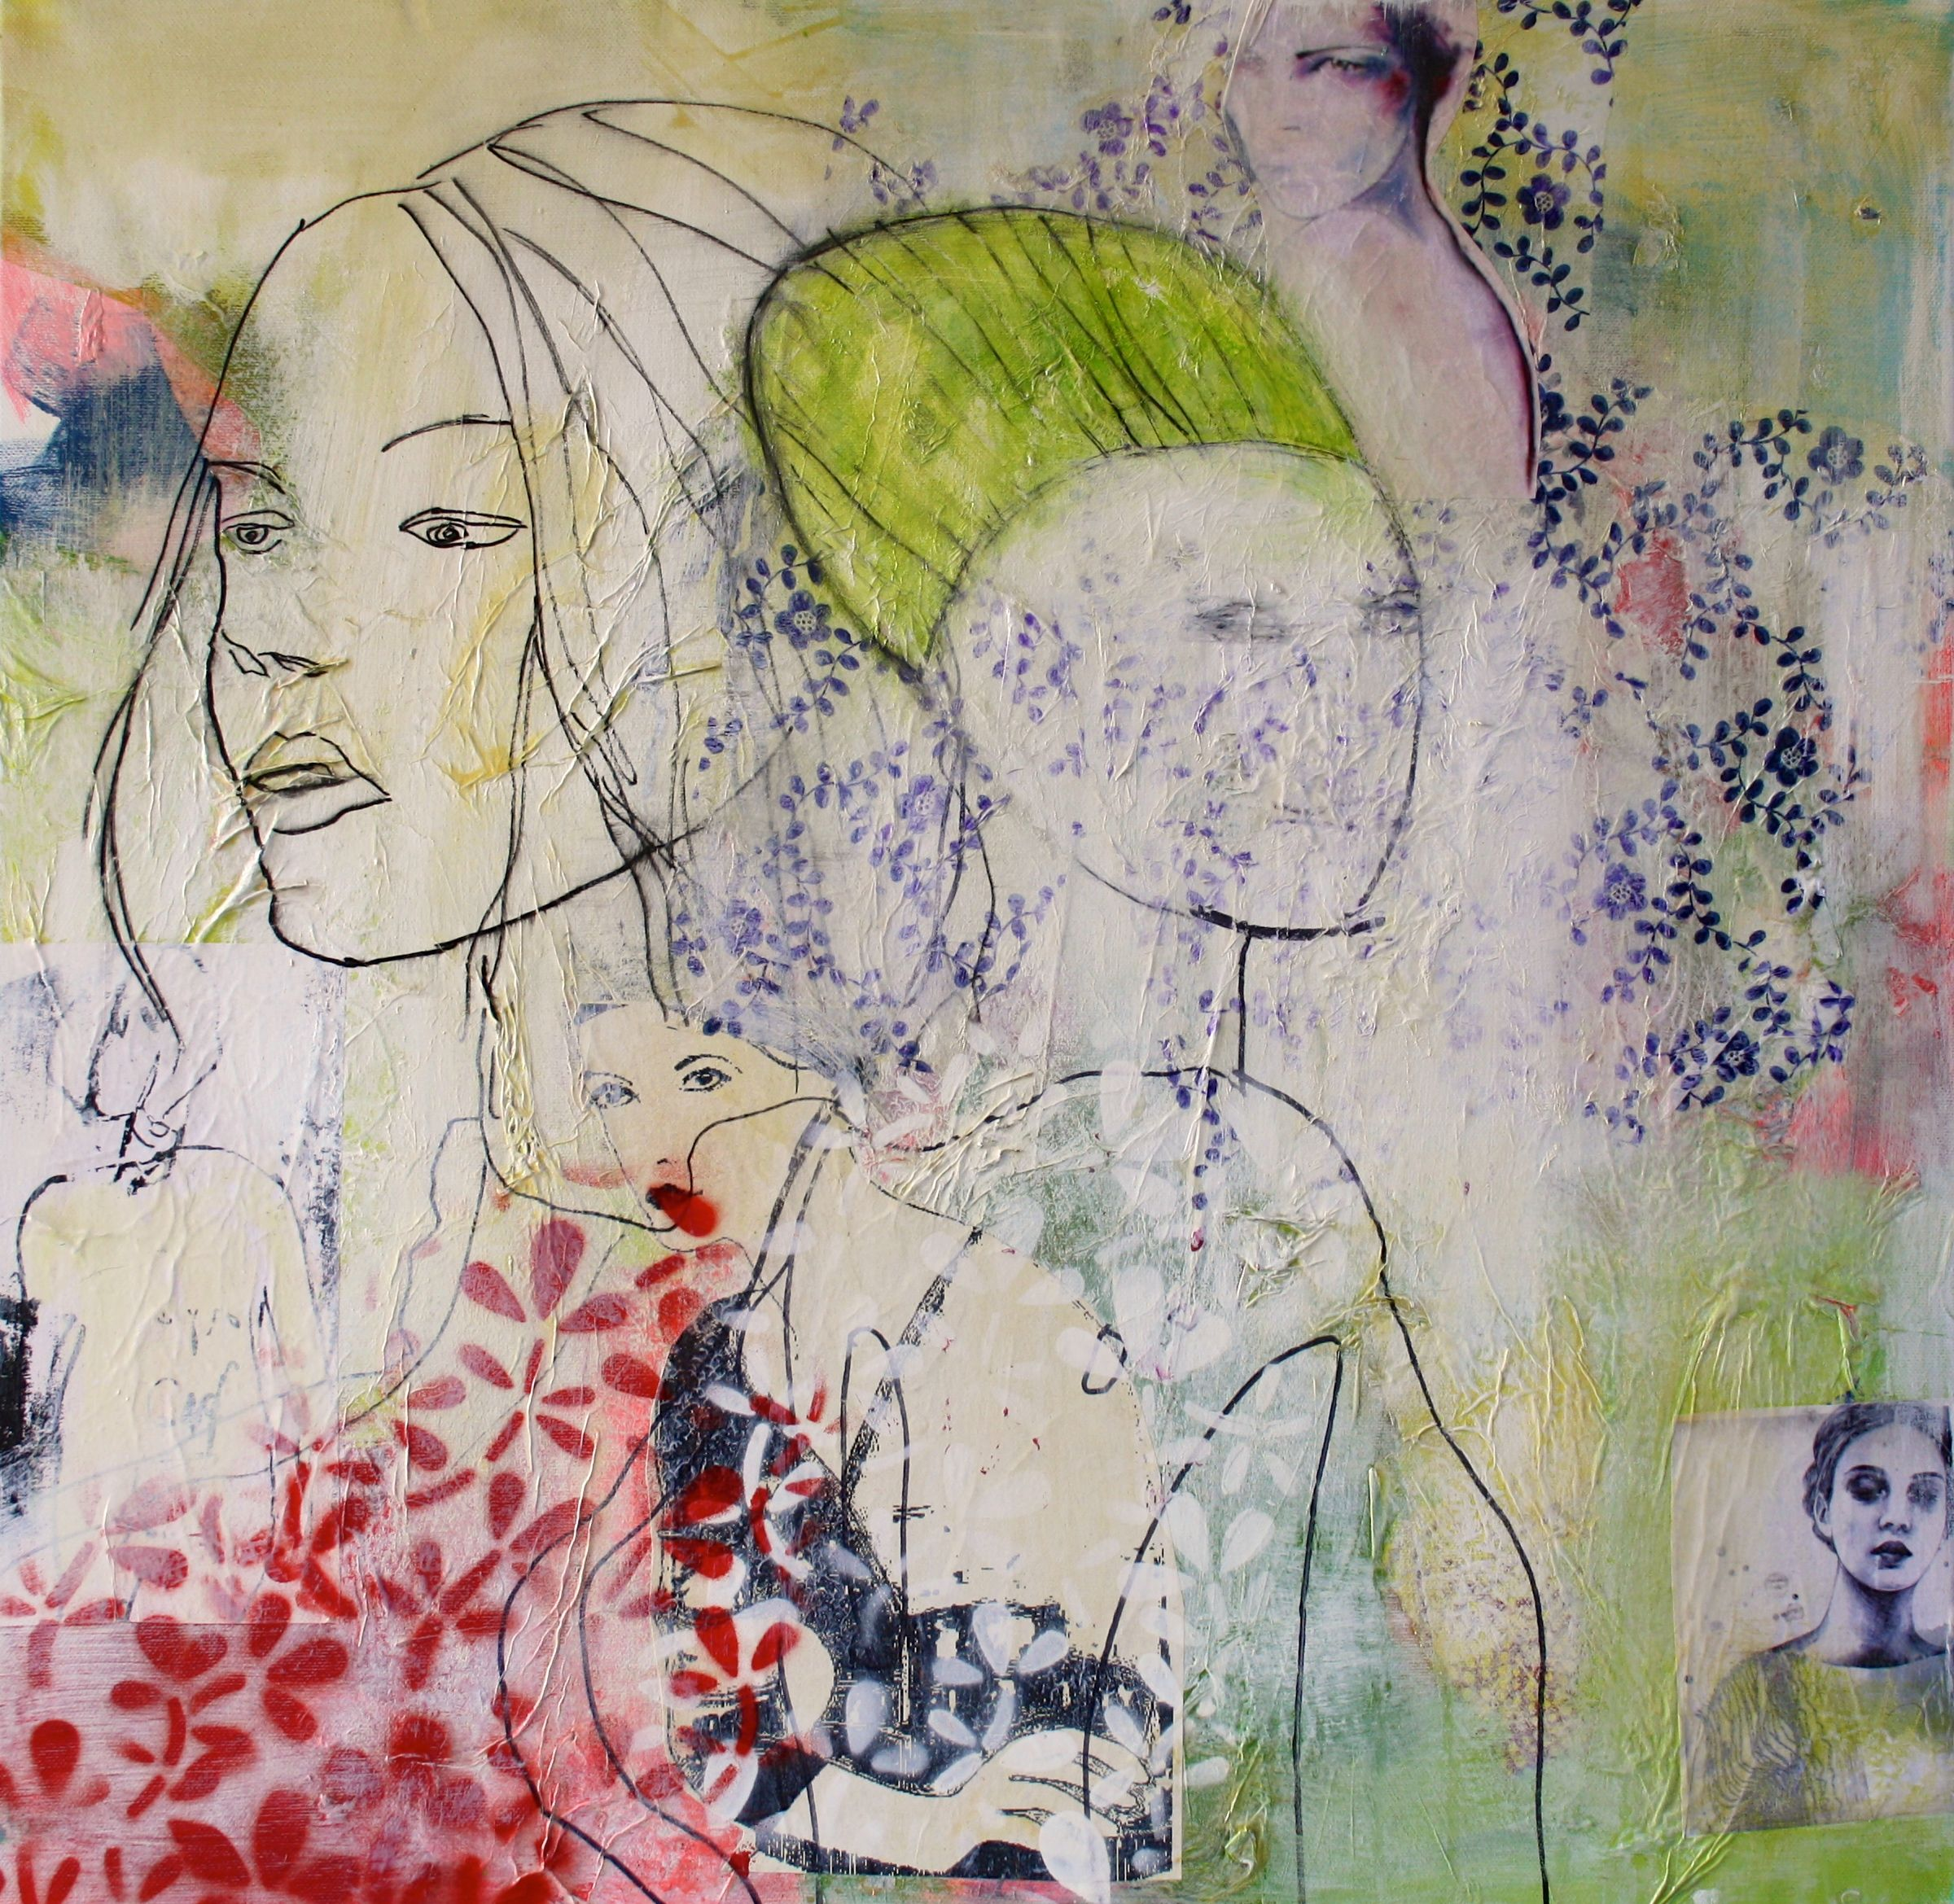 Mennesker Akryl Oilpastel Collage Papir Serigrafitryk Kul Blyant Tegning Maleri Galleri Www Rieskunstgal Portraet Tegning Abstrakte Malerier Kunsttryk